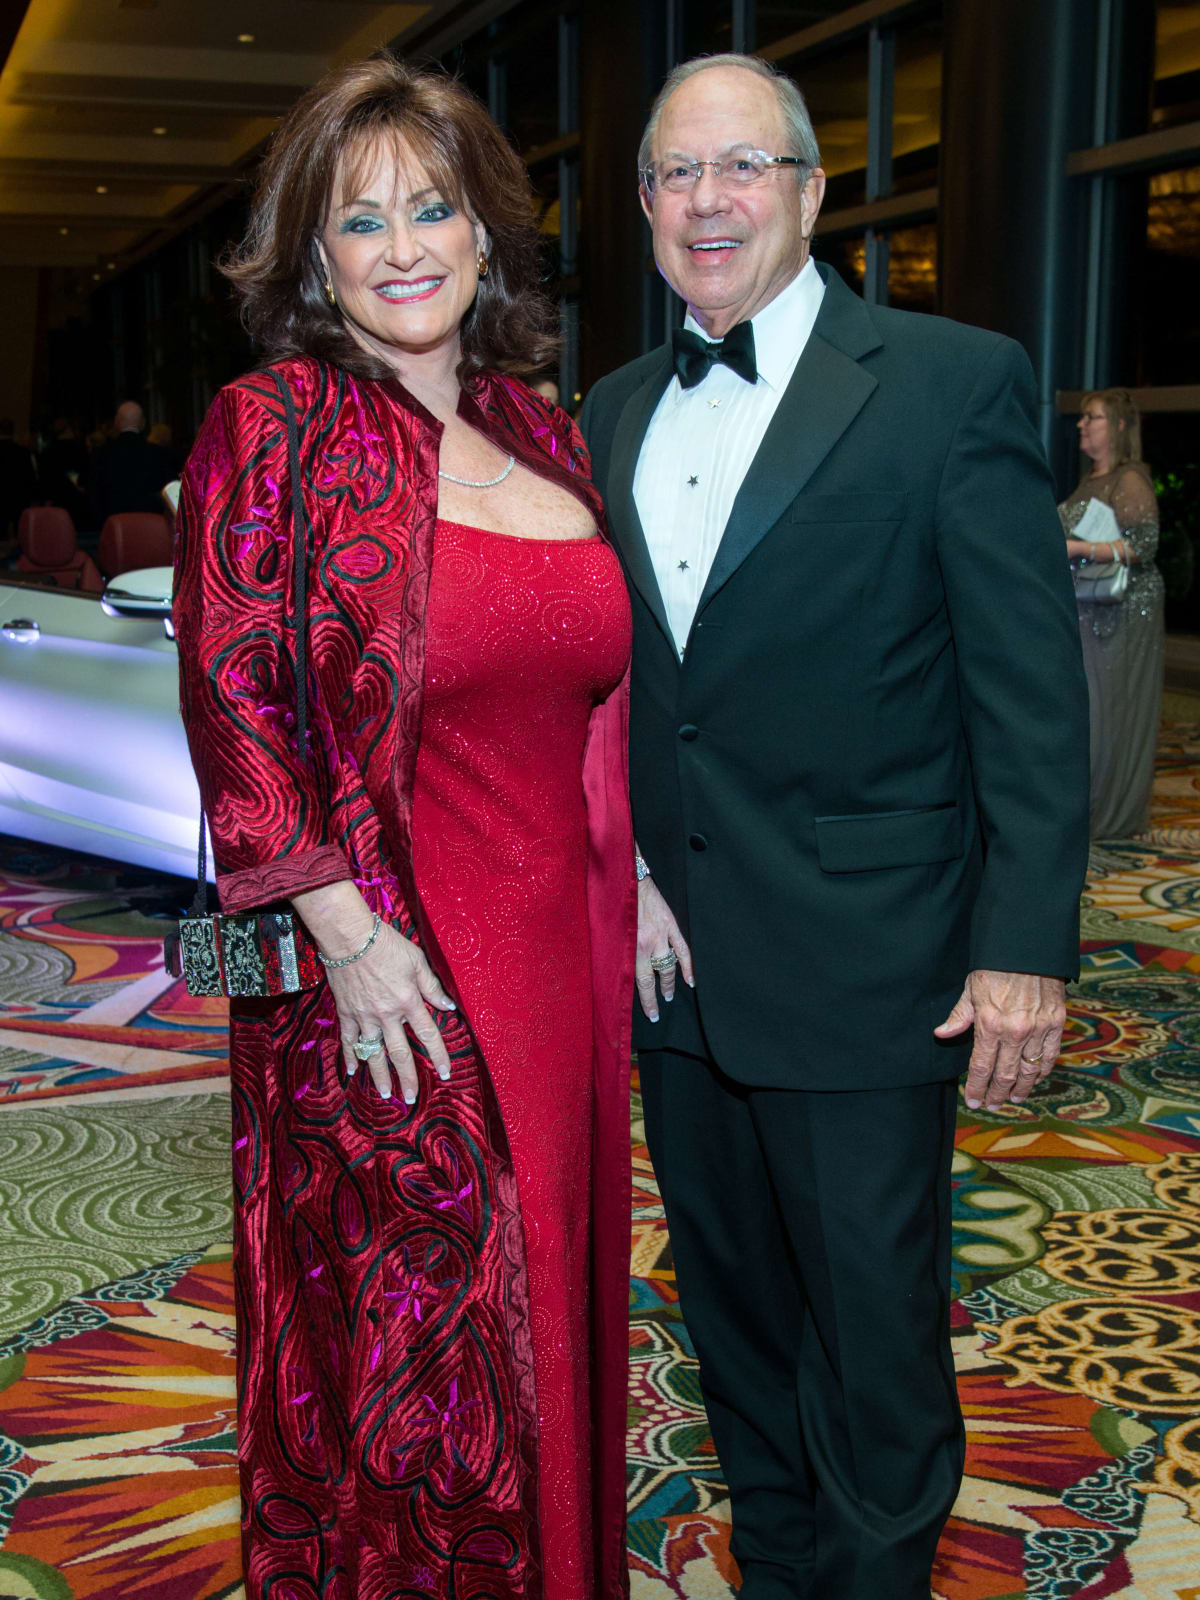 Houston, Women of Distinction fashionable gowns, Feb 2017, Carolyn Faulk, Pat Studdert